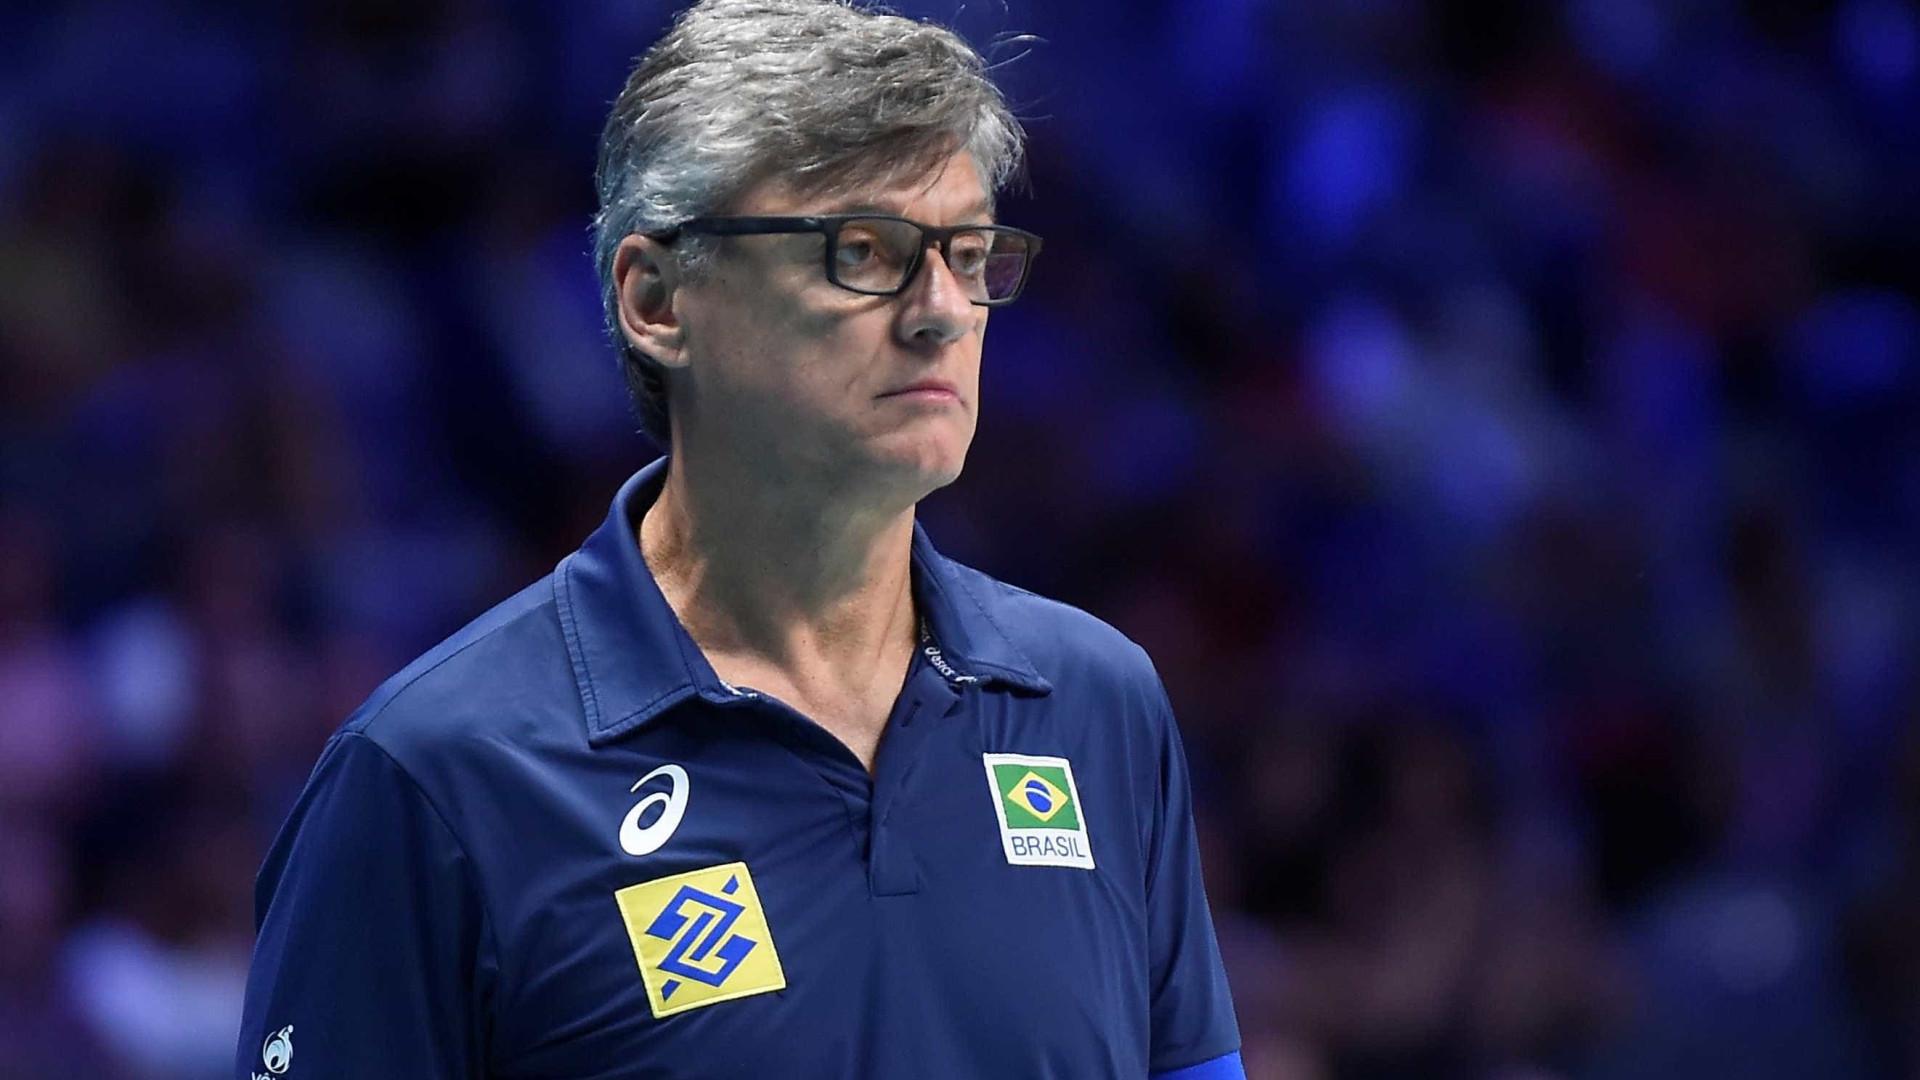 Internado no Rio com covid-19, Renan Dal Zotto é intubado nesta segunda-feira